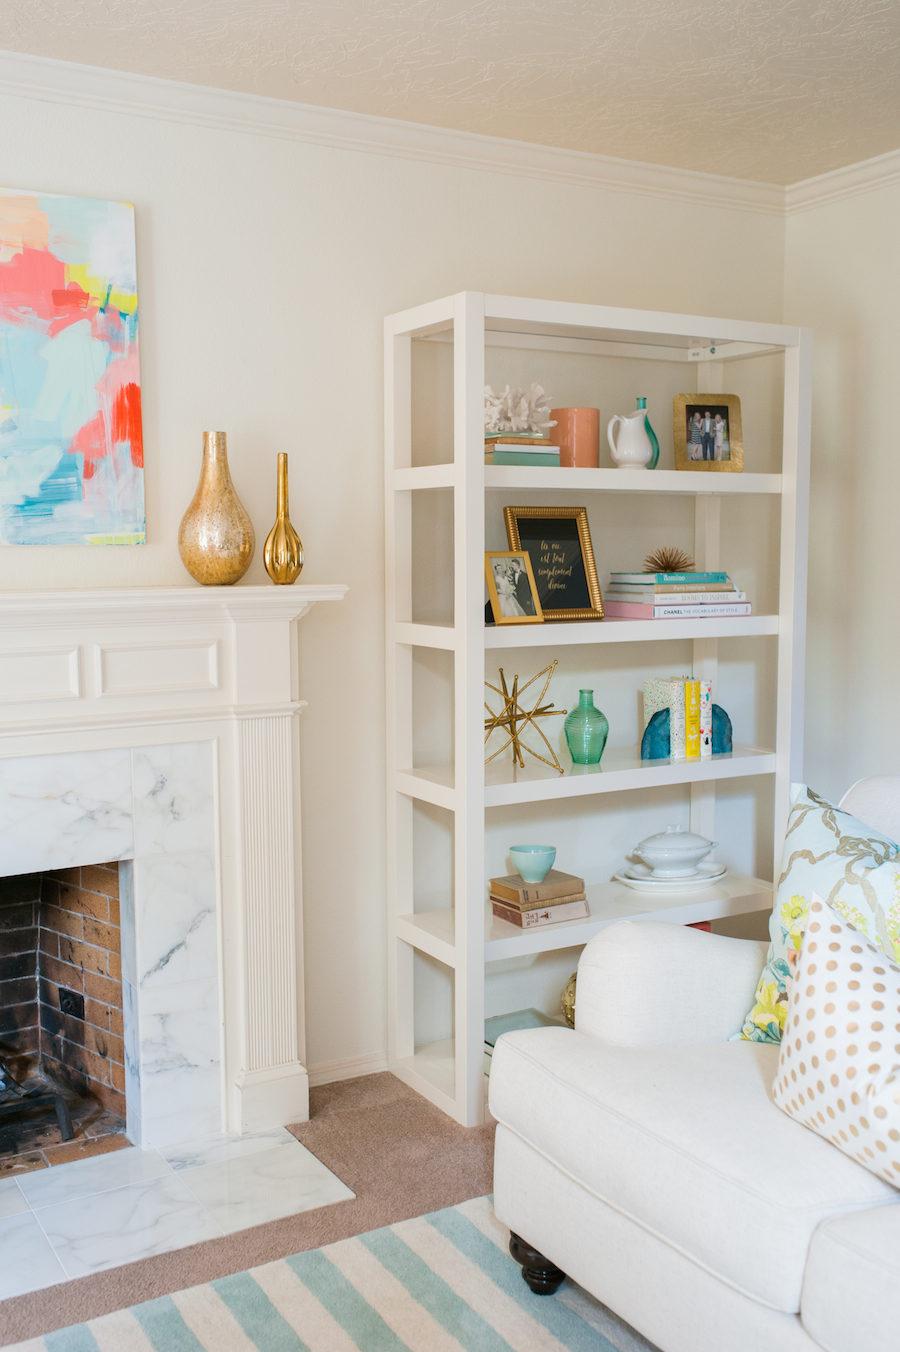 Whimsical Living Room Full of Color